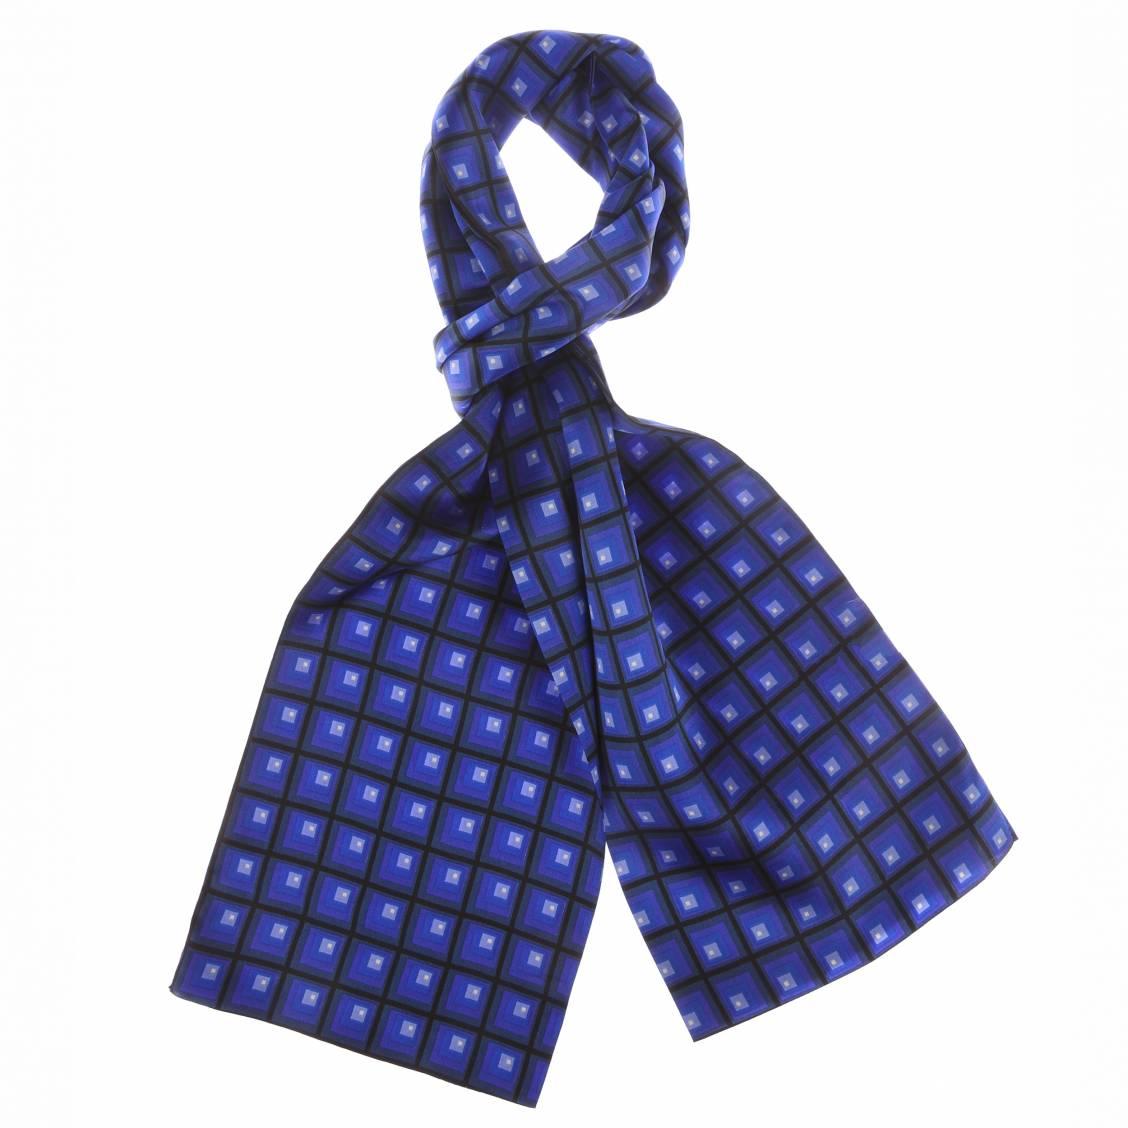 echarpe en soie indigo motifs carr s bleus rue des hommes. Black Bedroom Furniture Sets. Home Design Ideas